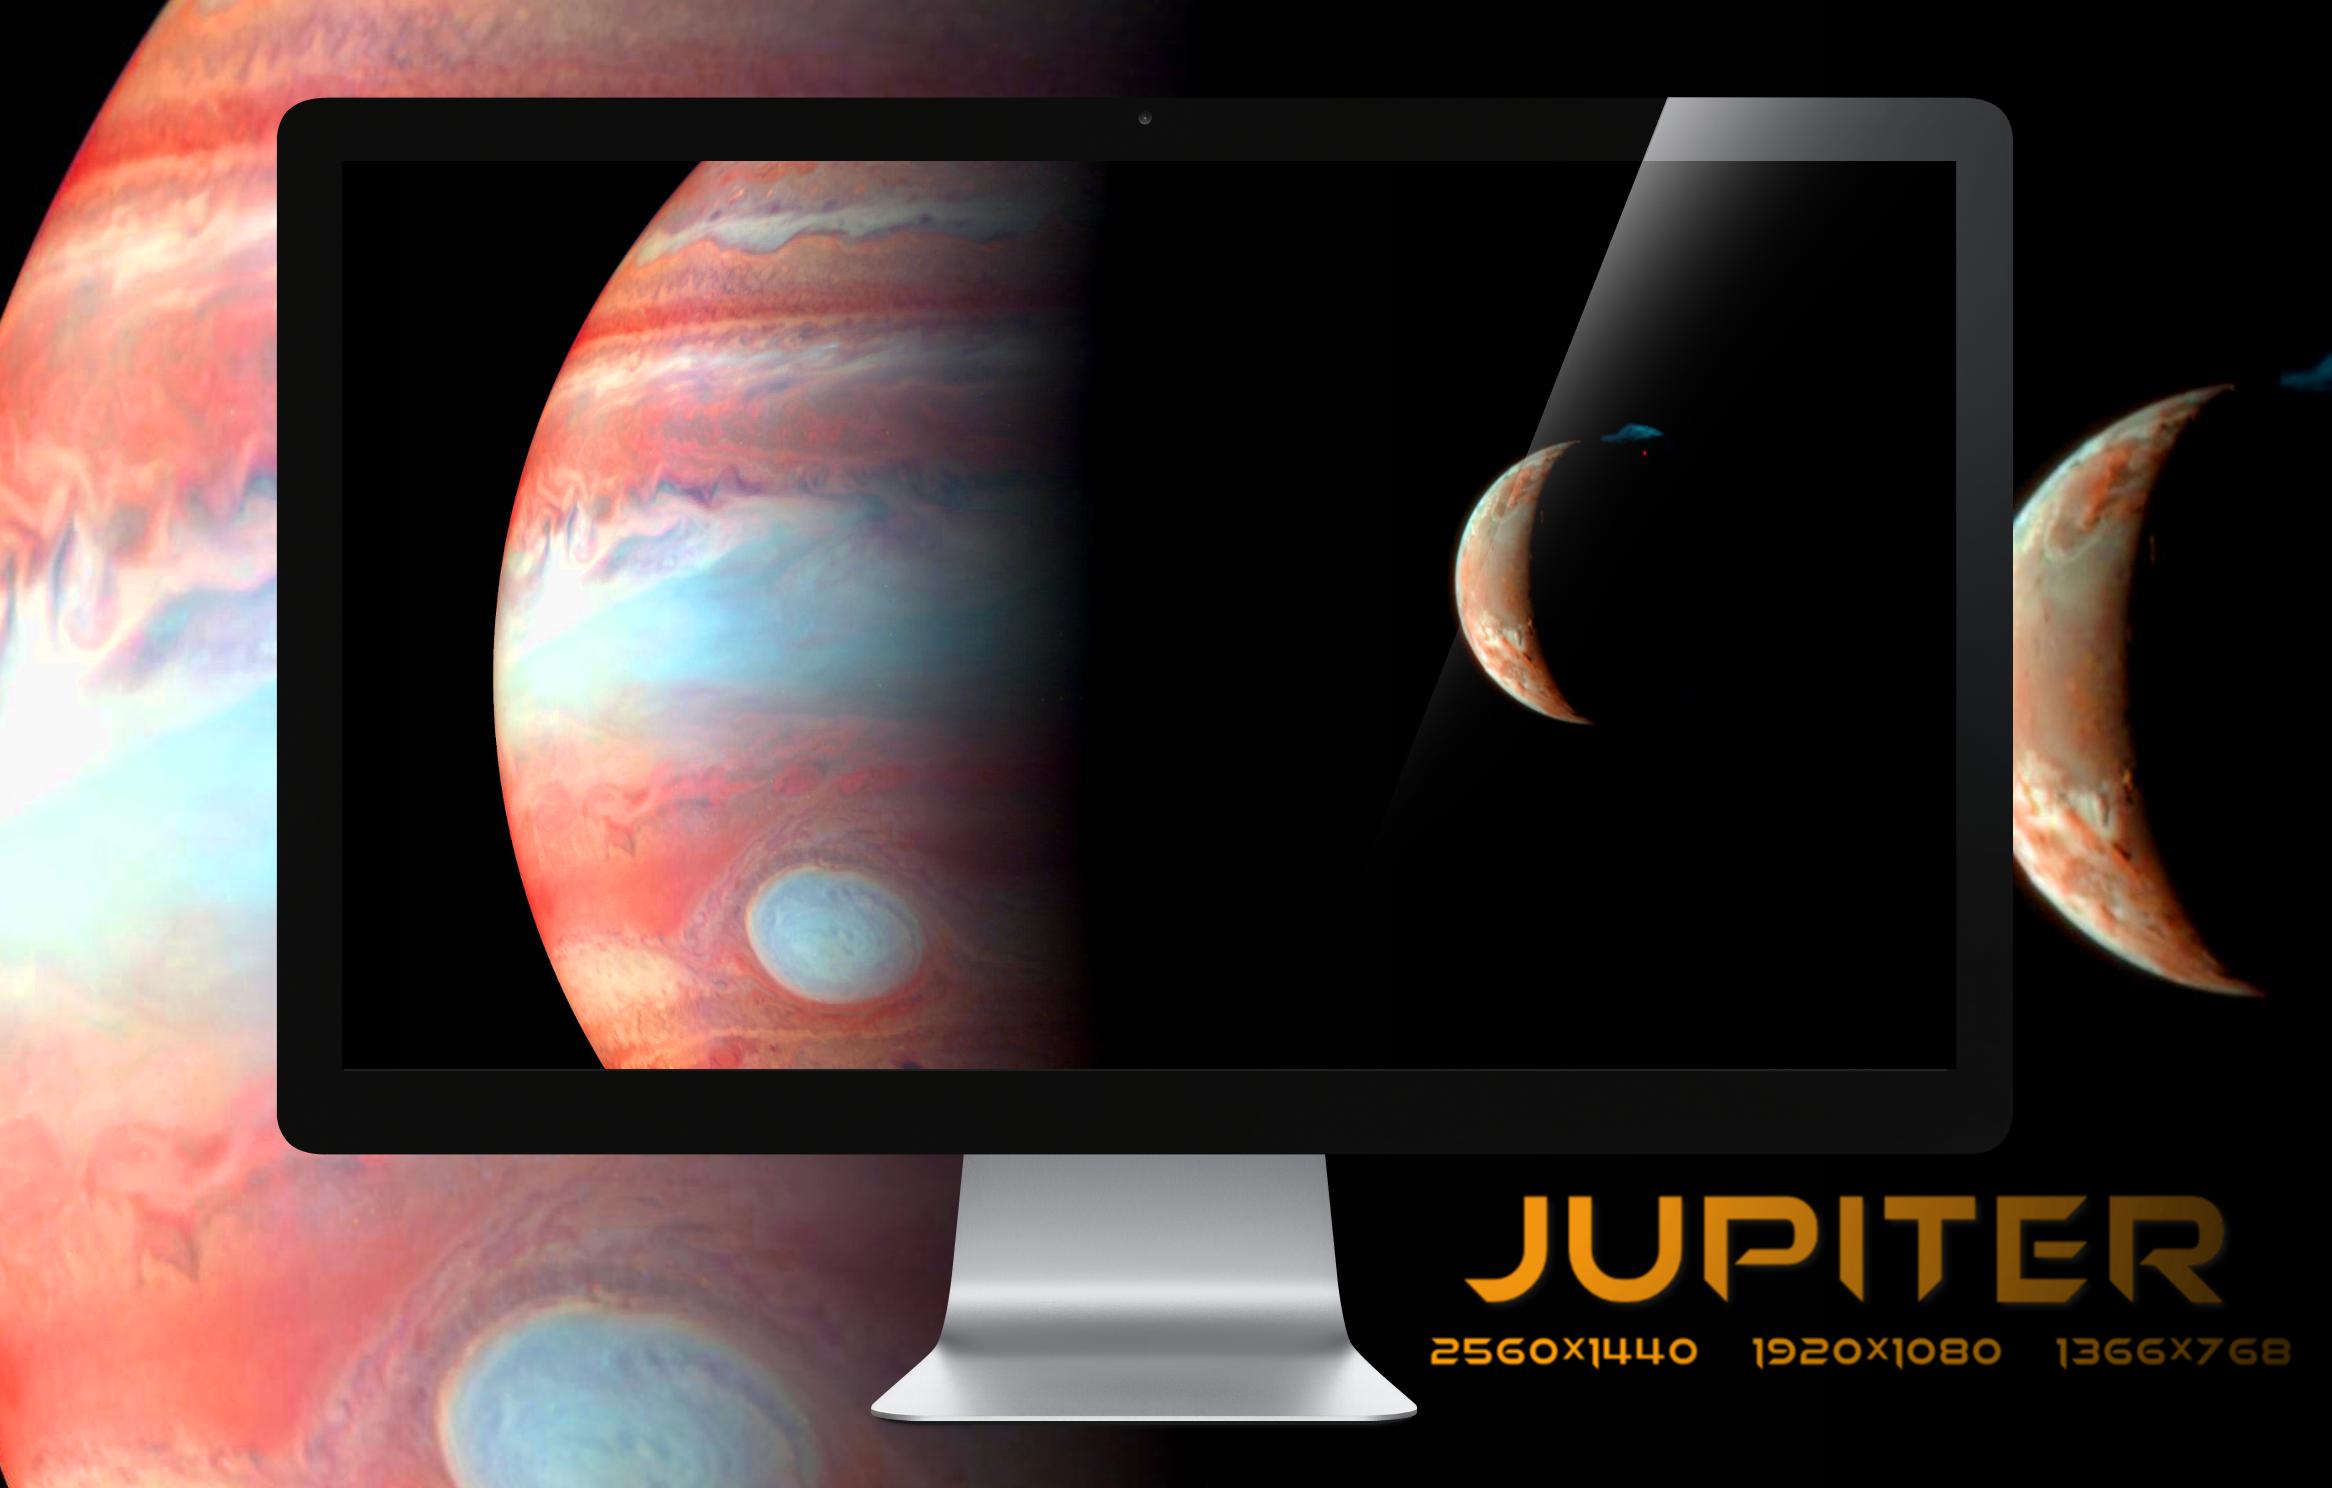 Jupiter Wallpaper Pack by miguelsanchez666